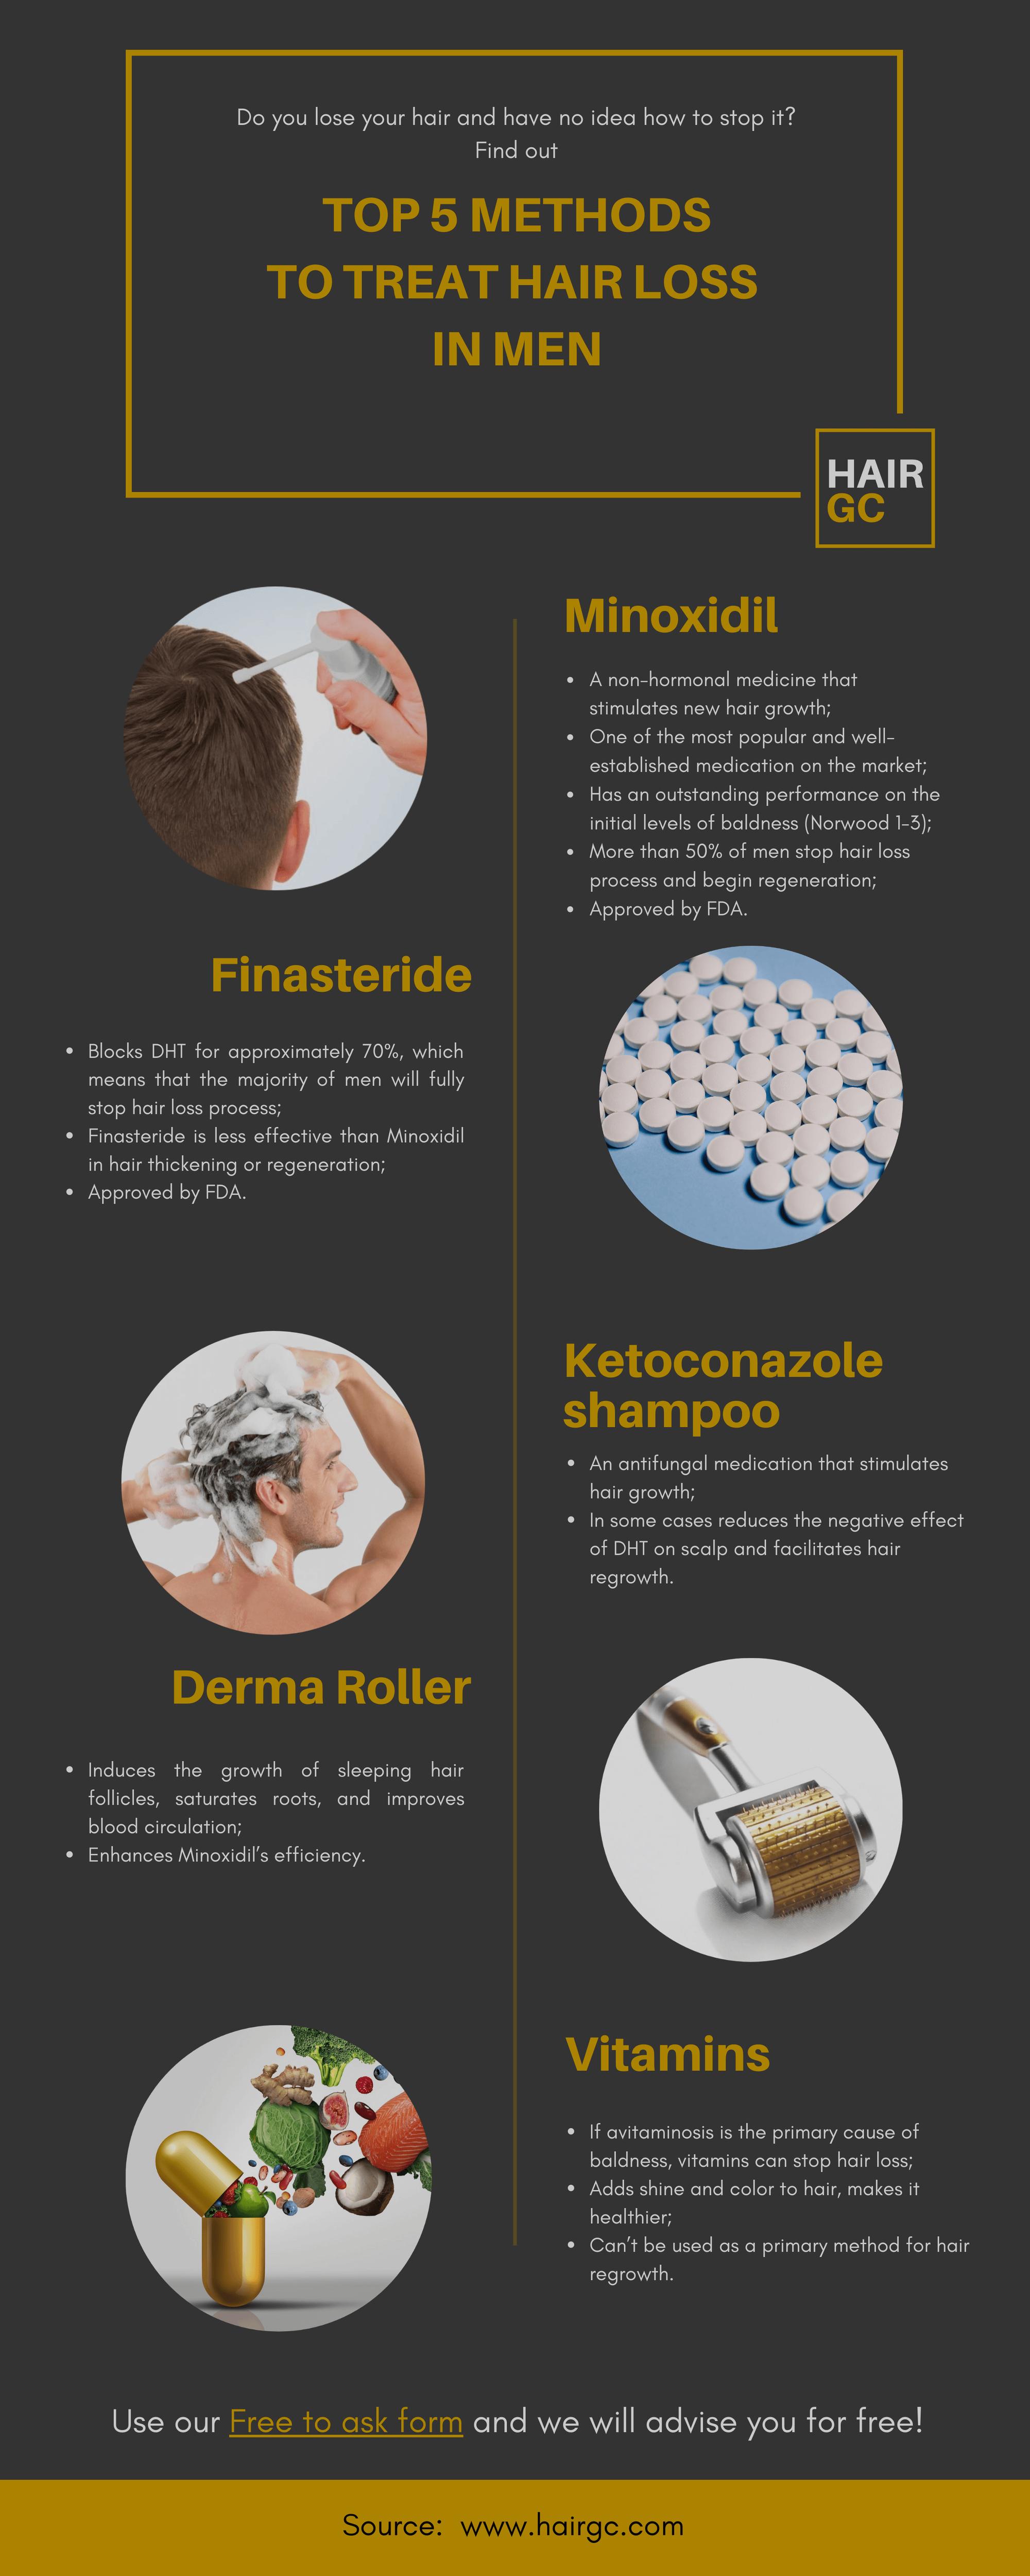 TOP 5 METHODS TO TREAT HAIR LOSS IN MEN